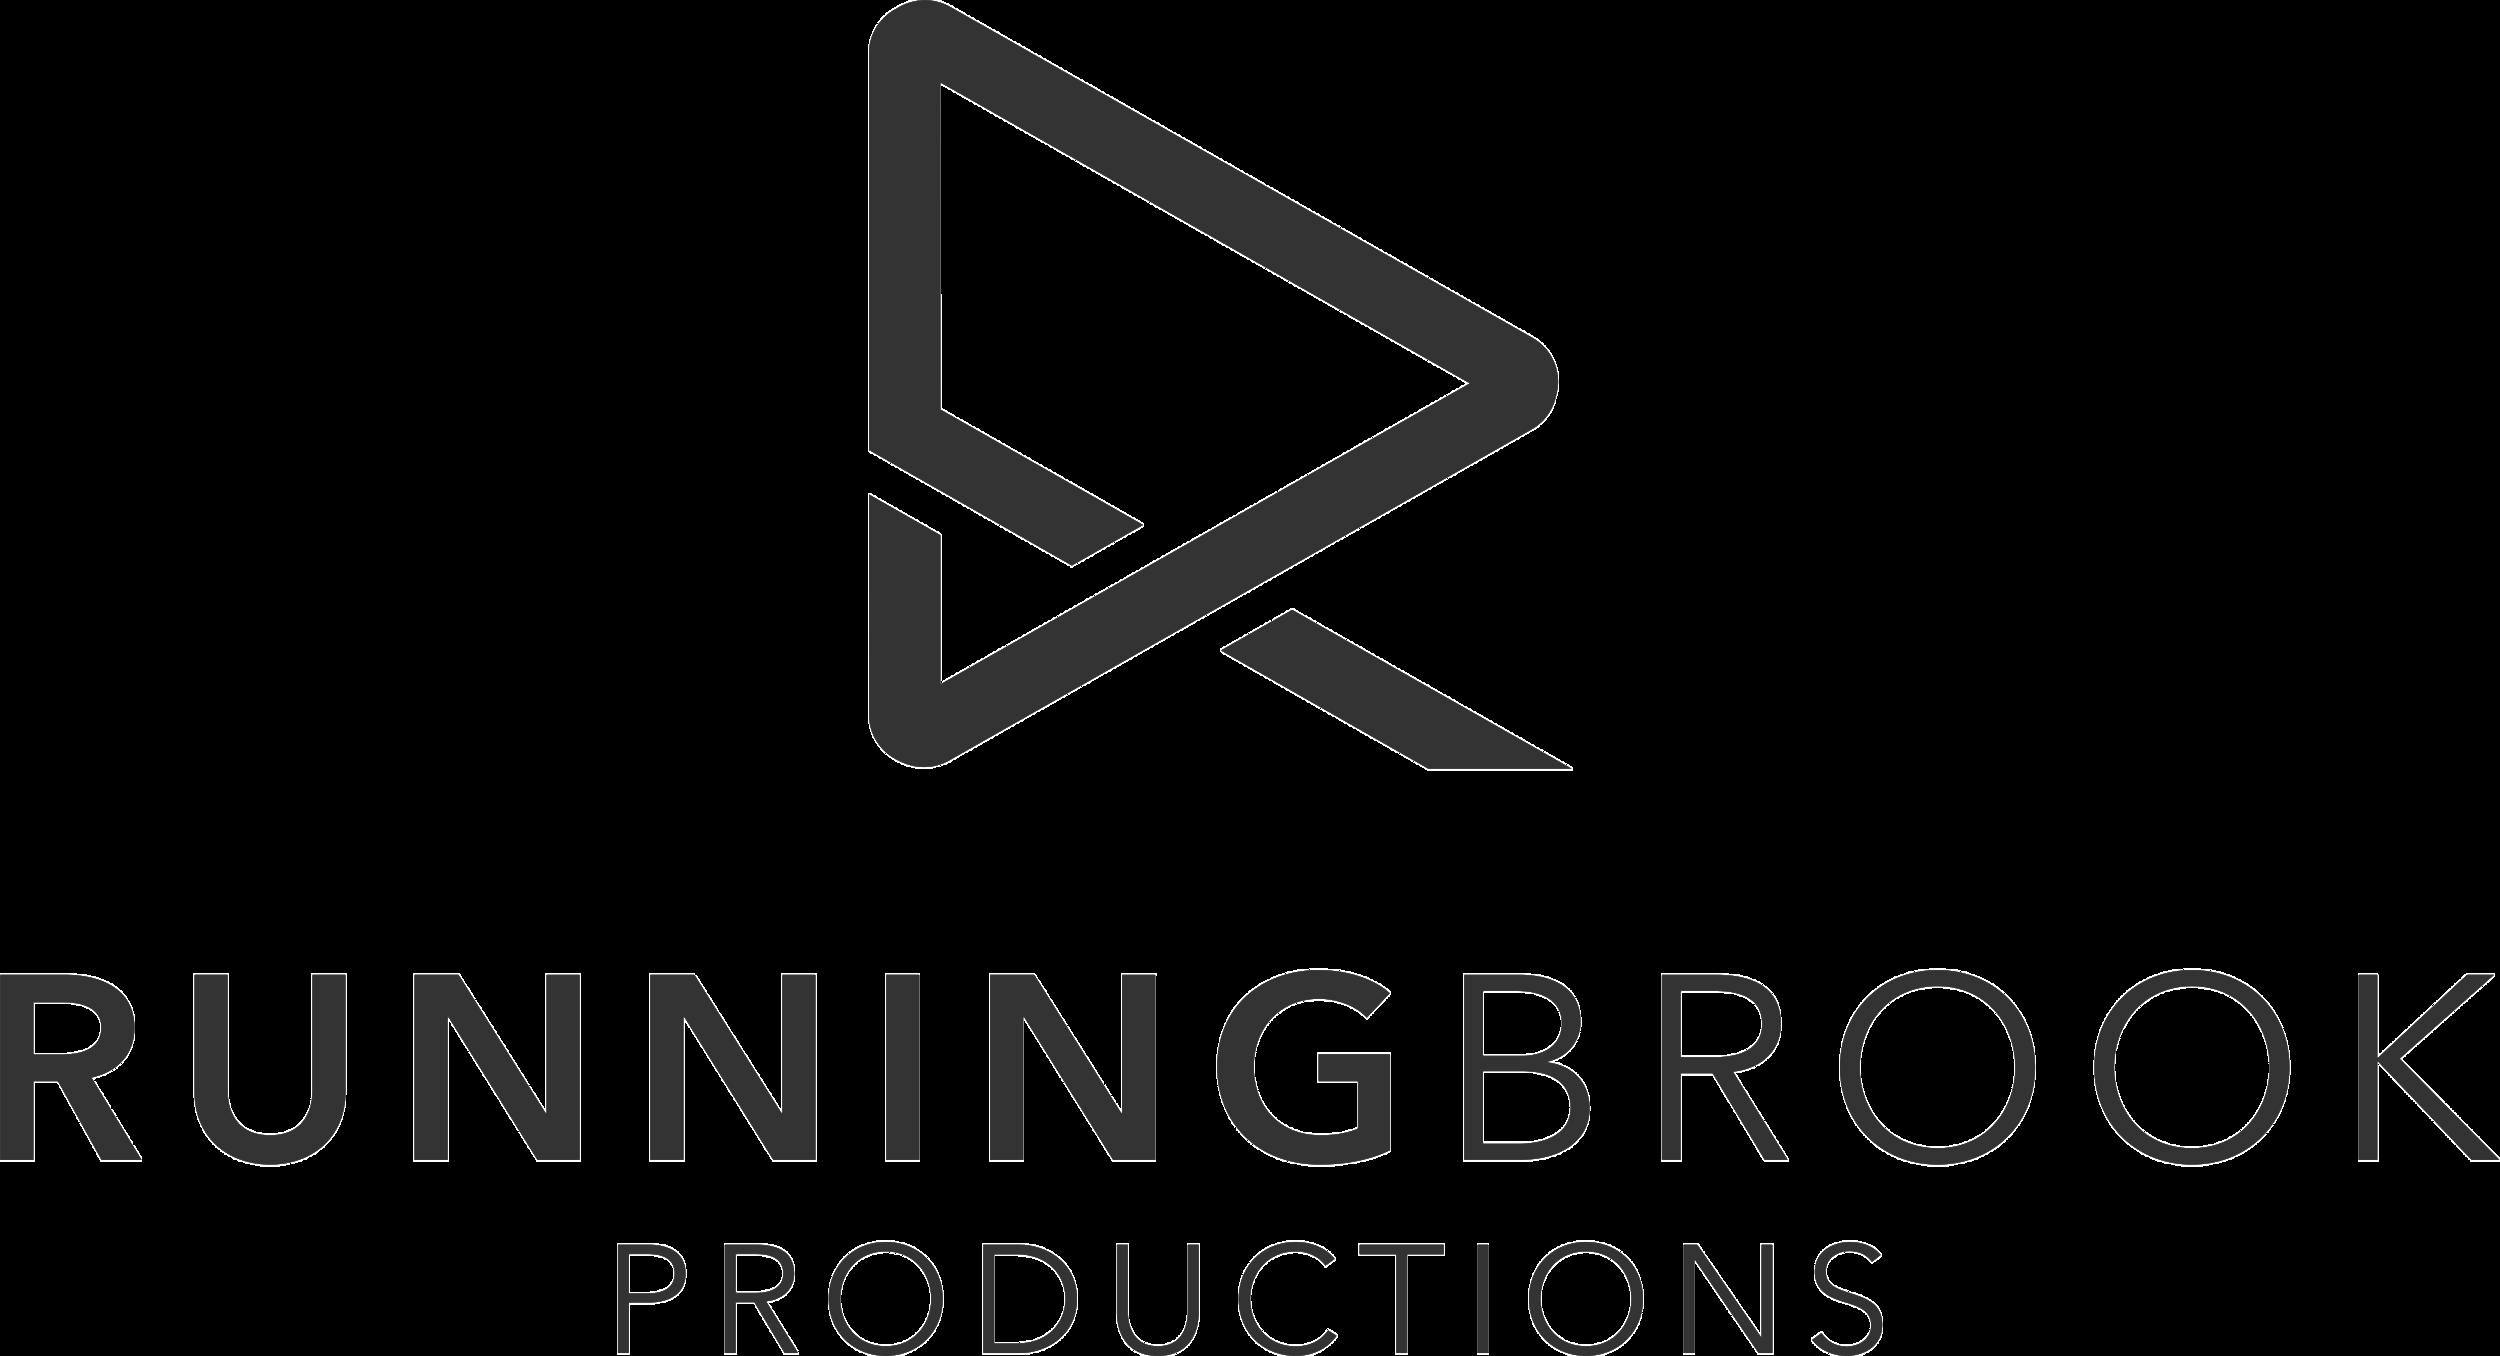 Running Brook Productions_Black Logo.png